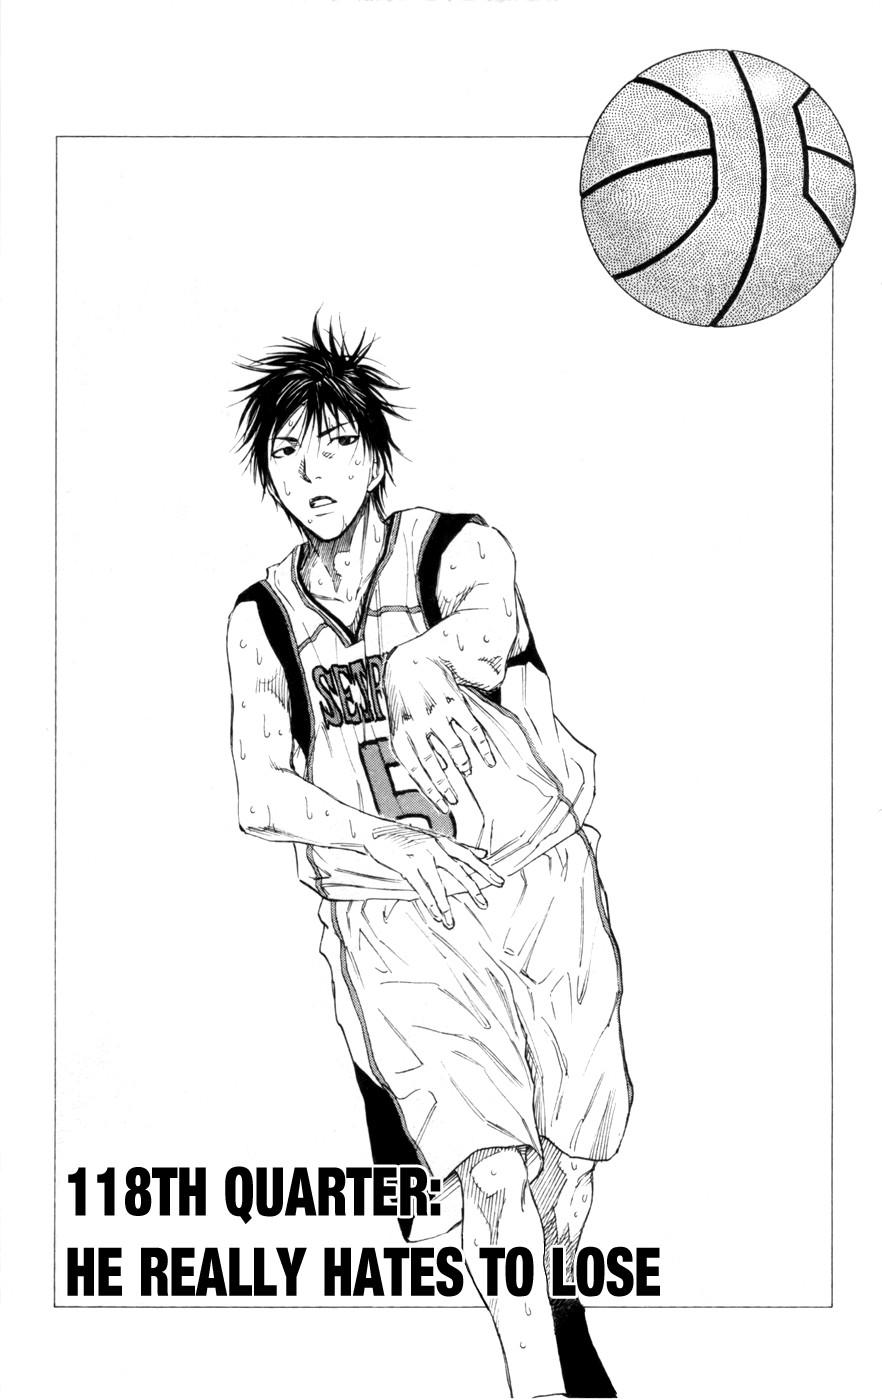 Kuroko no Basket Manga Chapter 118 - Image 4_009